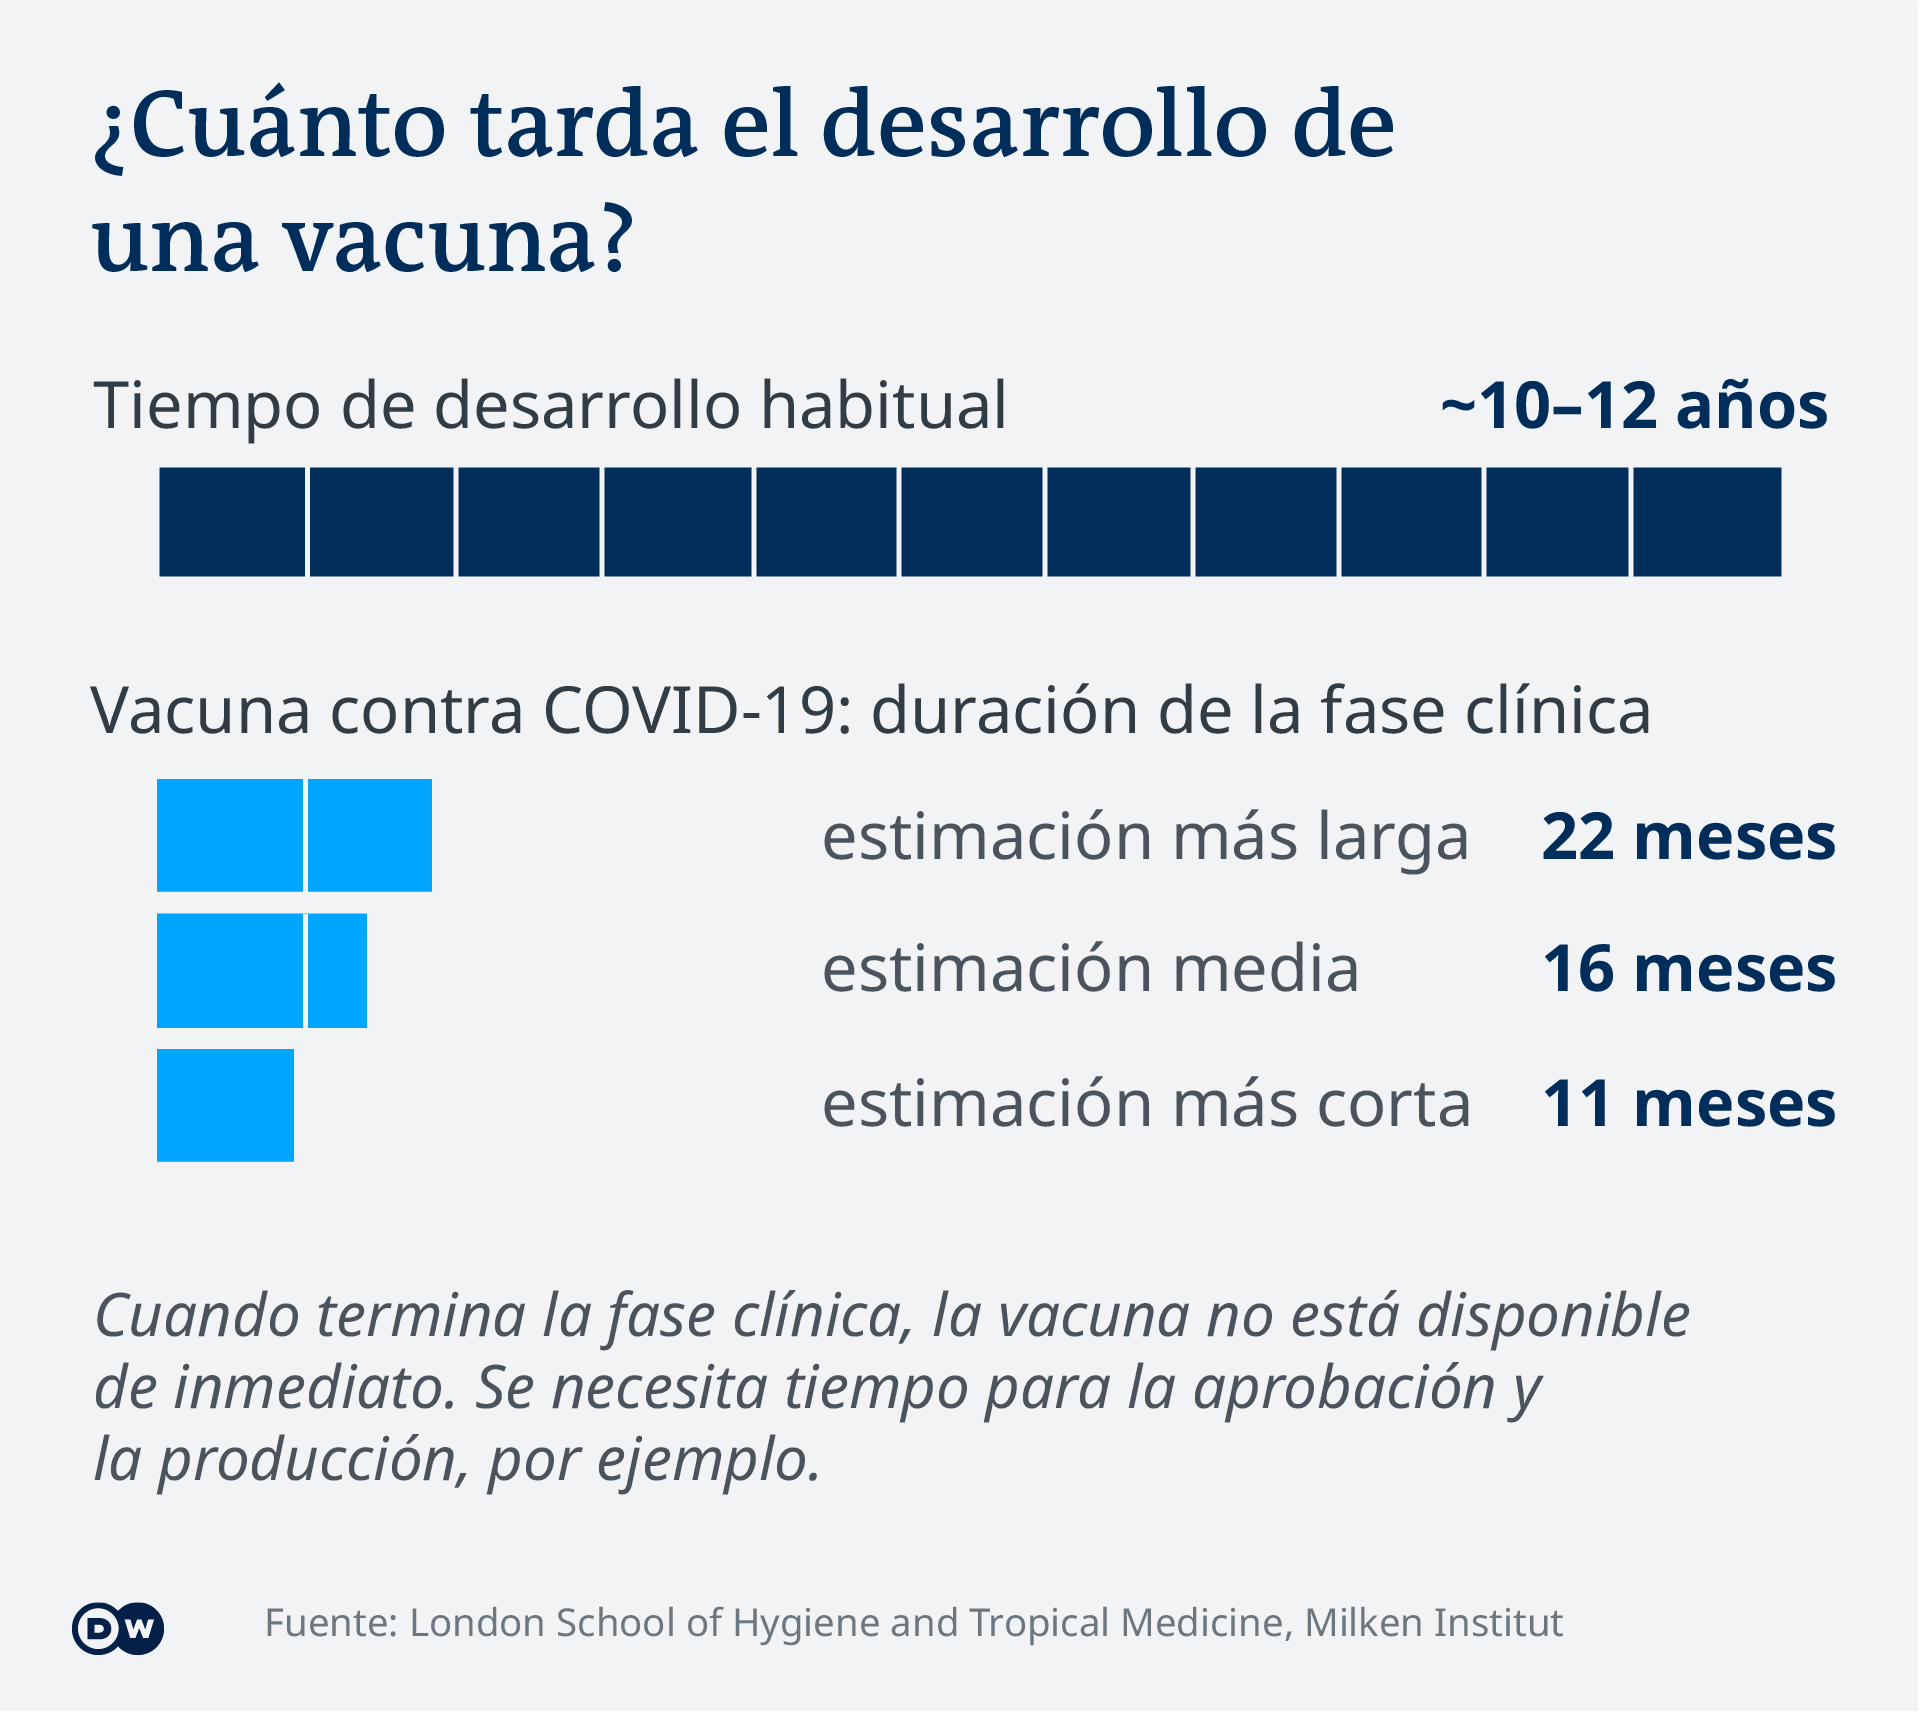 Data visualization - COVID-19 vaccine tracker - Duration - Update Dec 18, 2020 - Spanish